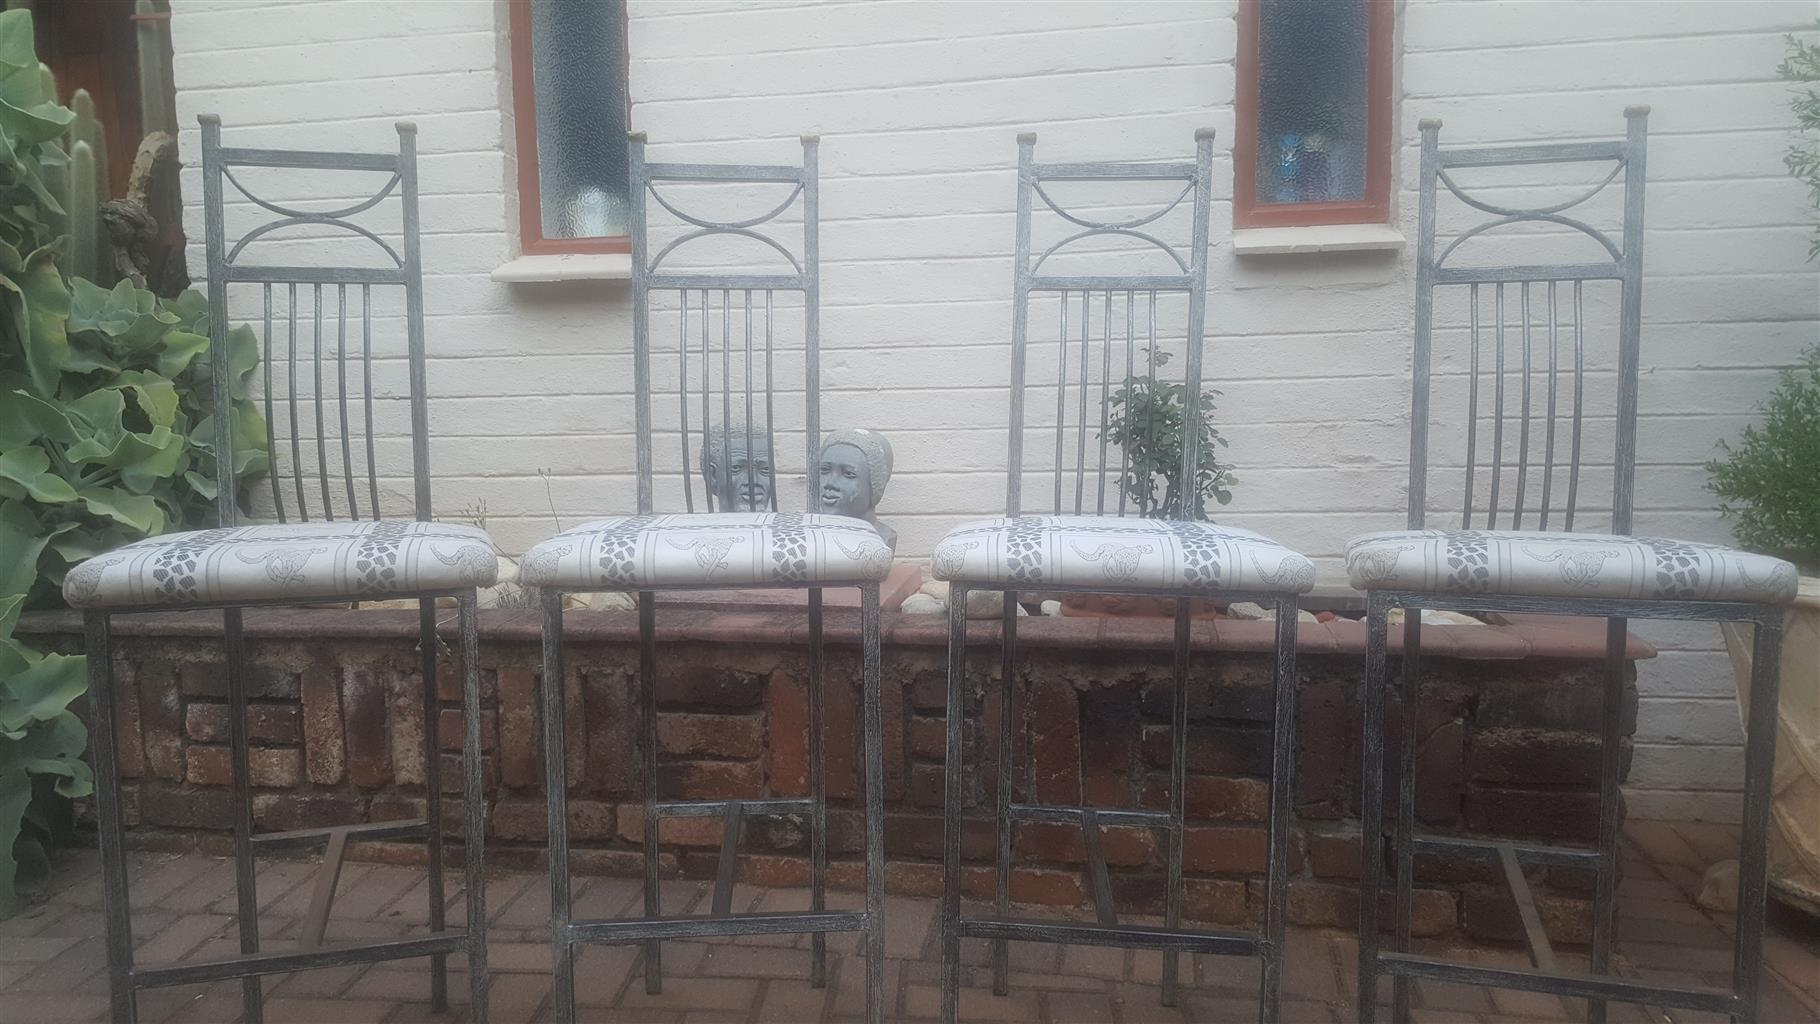 4 X BESPOKE METAL BAR STOOLS FOR SALE